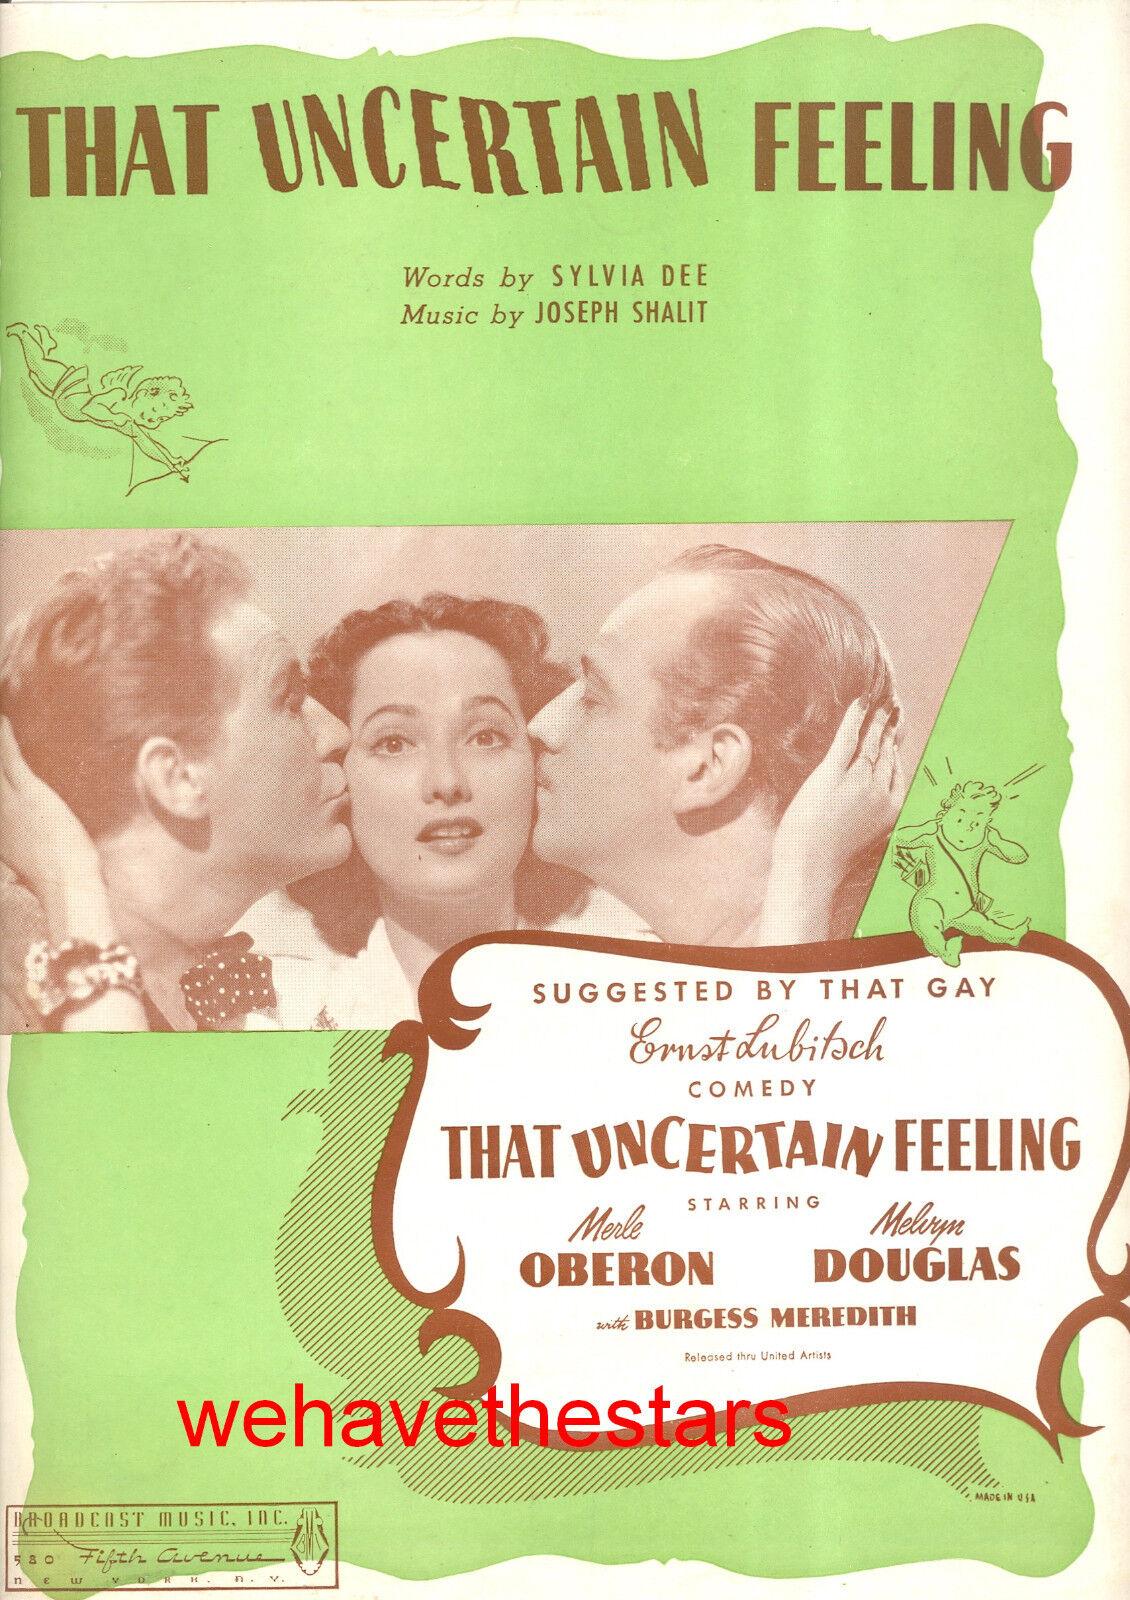 THAT Unfixed FEELING Sheet Music Merle Oberon Melvyn Douglas Ernst Lubitsch